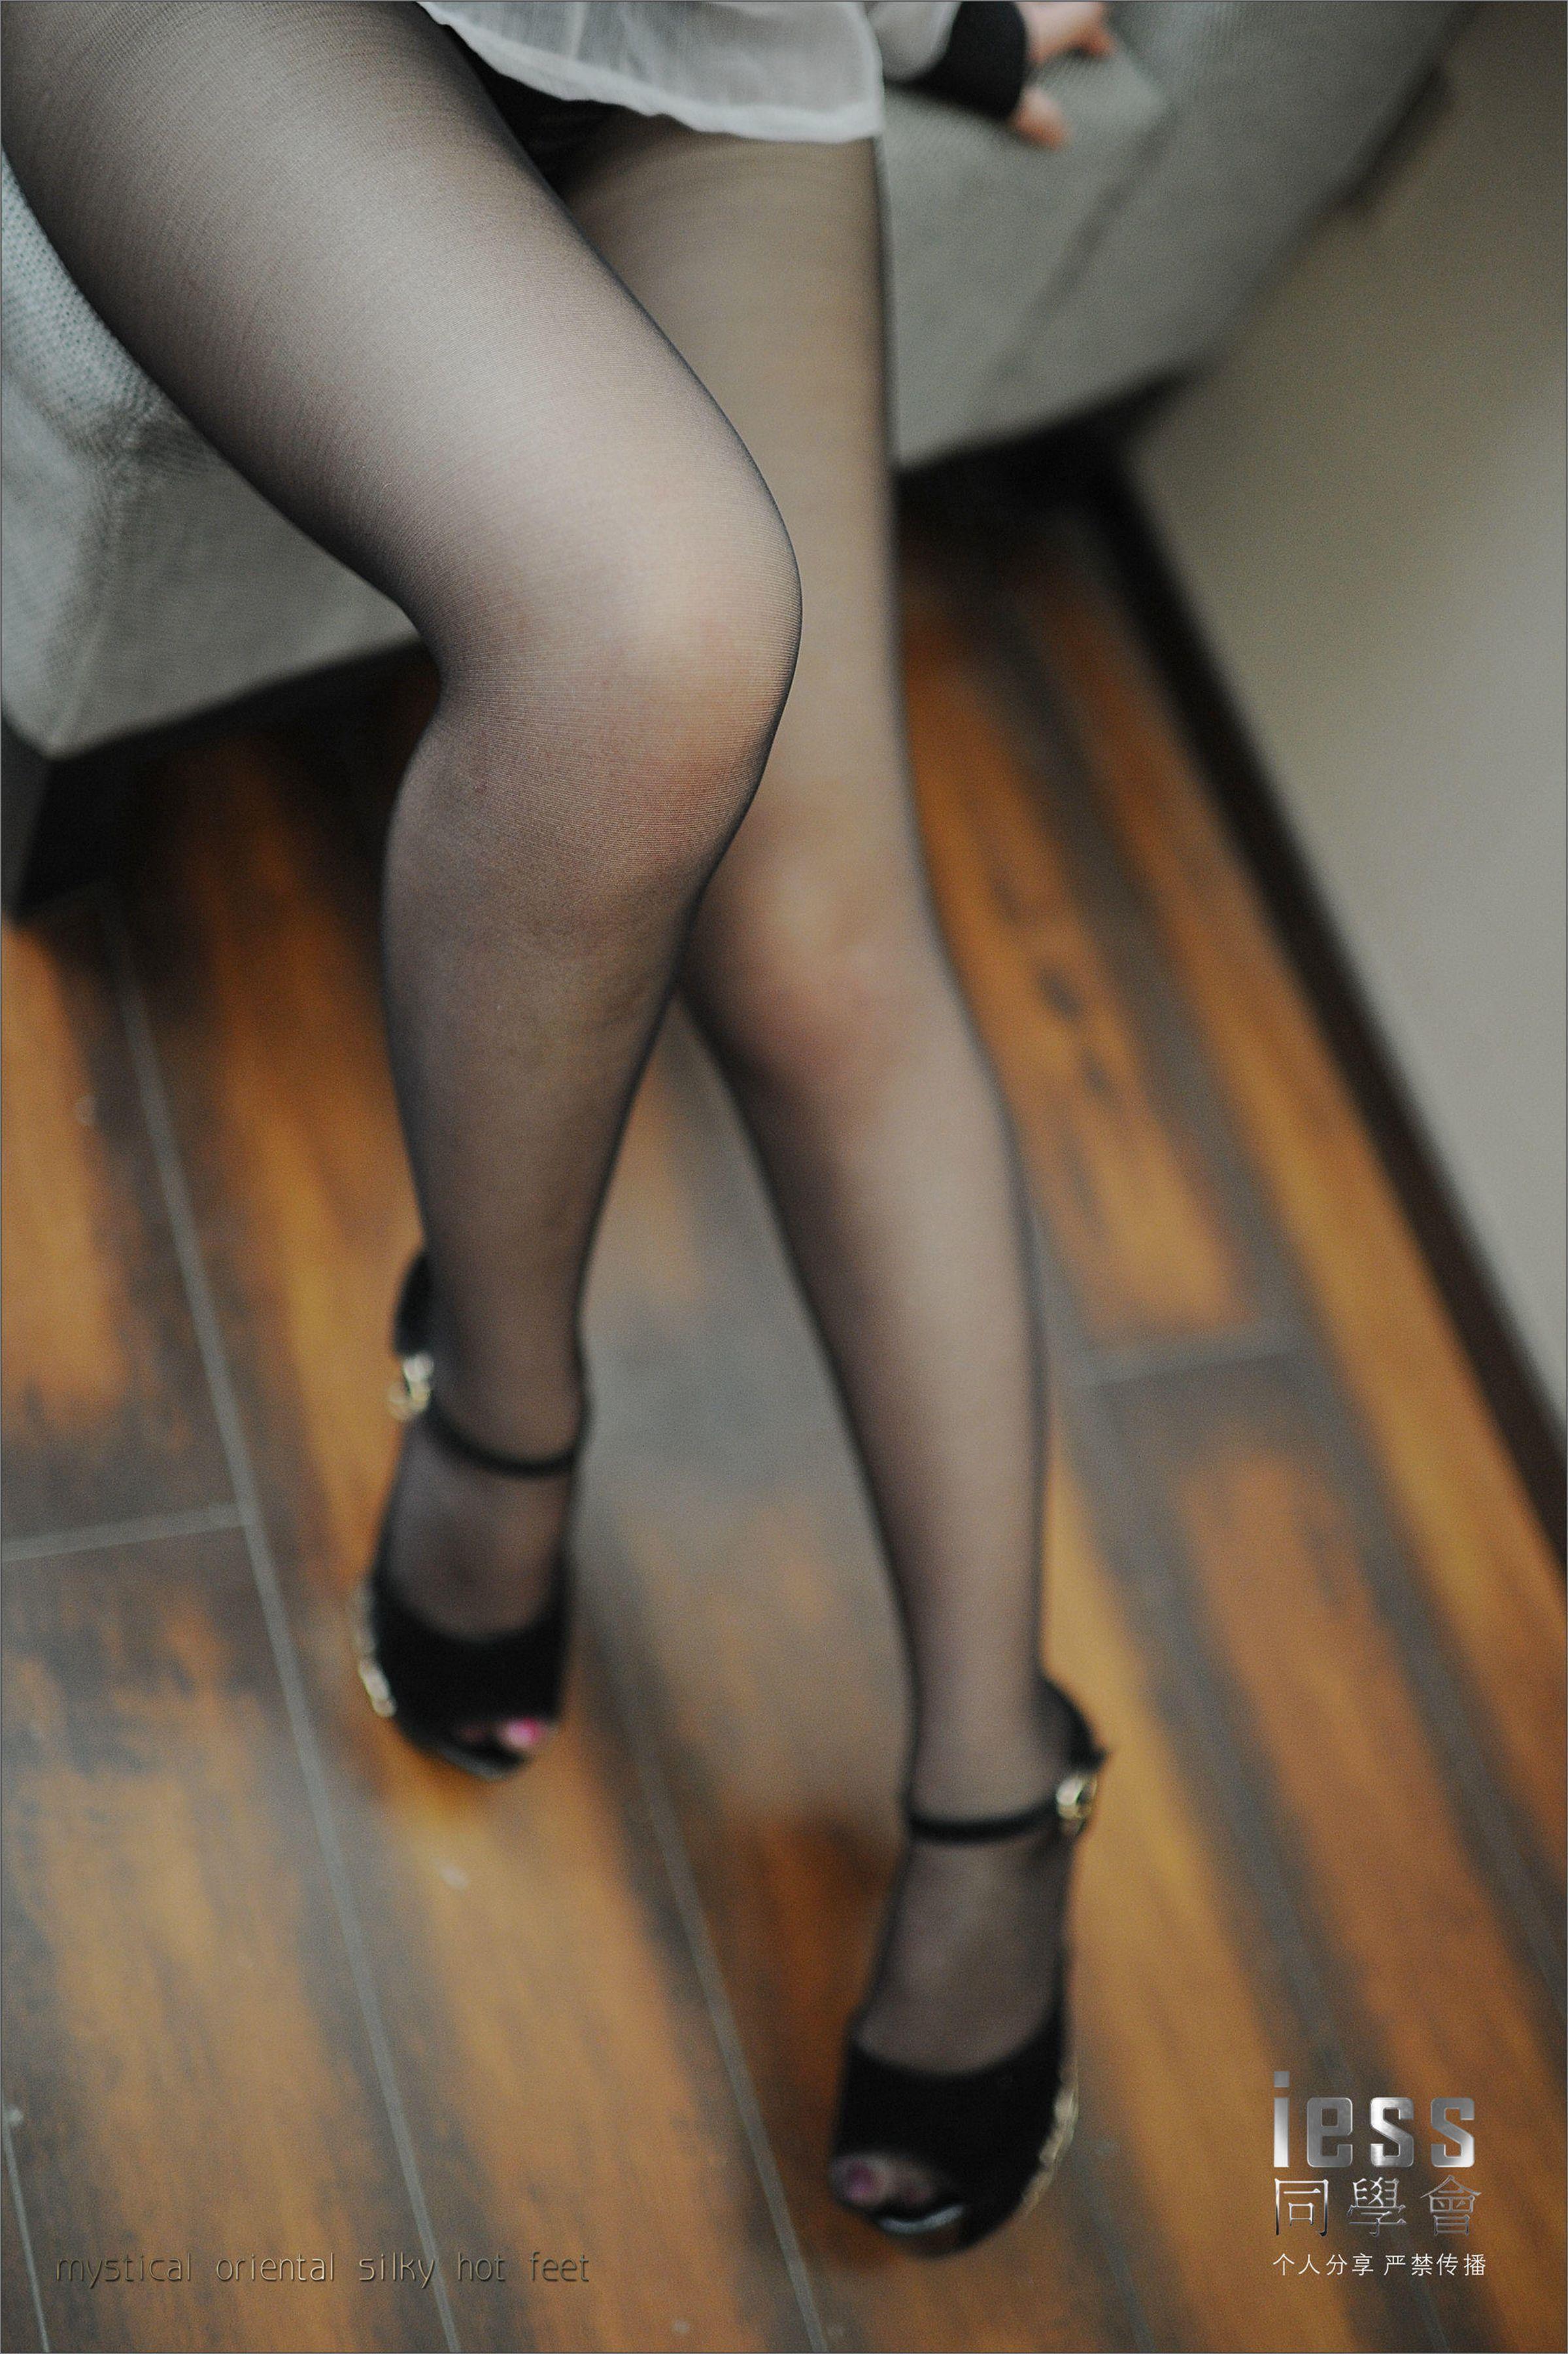 [IESS异思趣向]Model 梦梦 白色衬衫与性感内衣加黑色丝袜美腿私房写真集